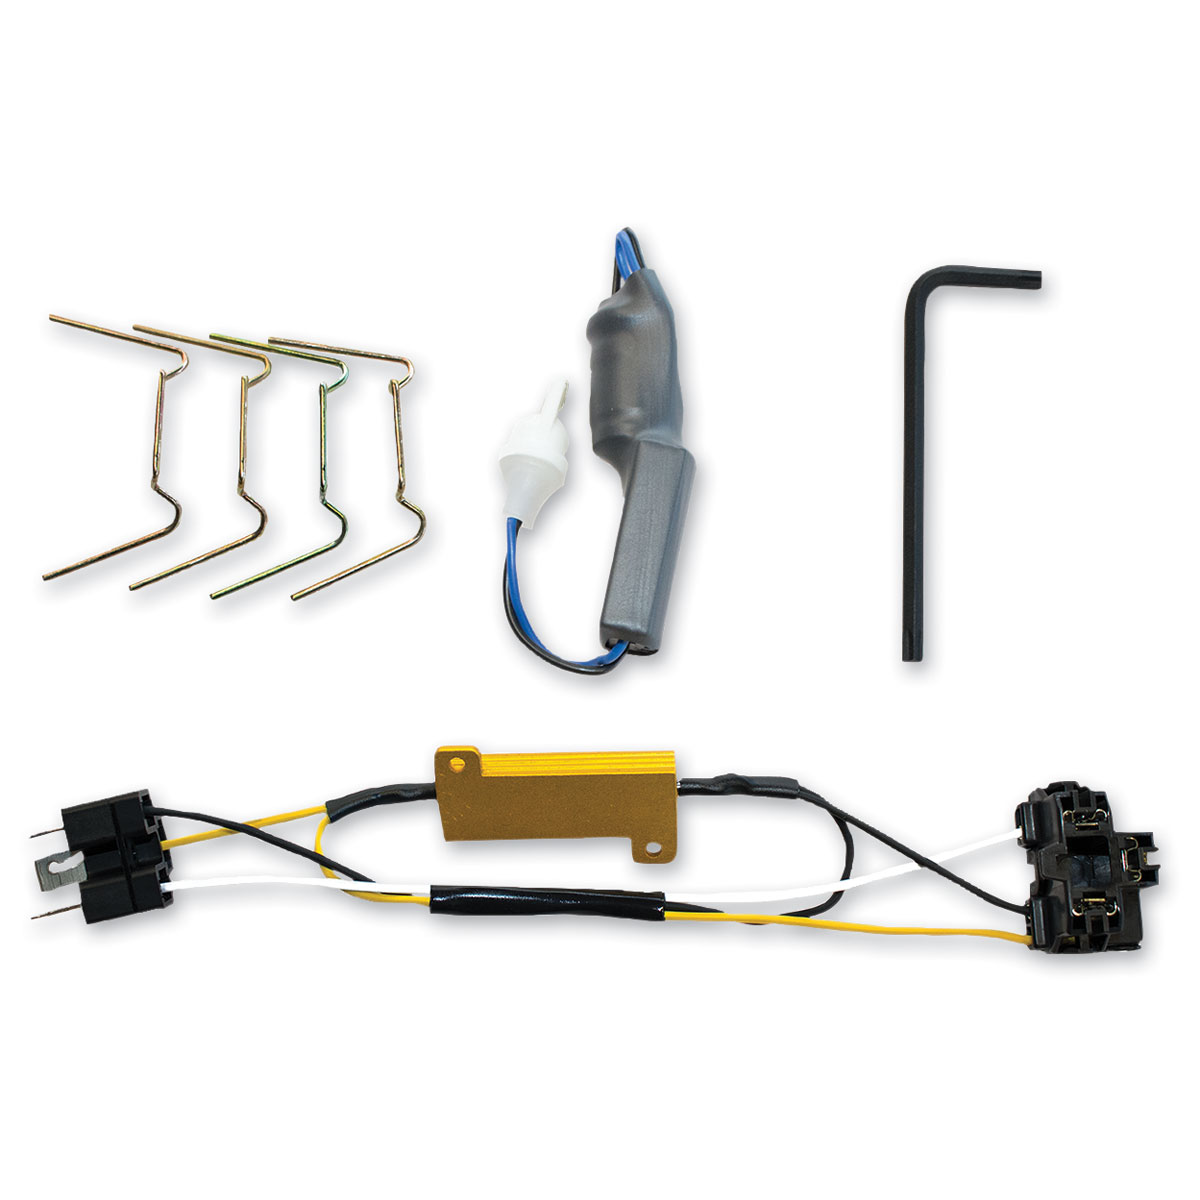 J.W. Speaker Headlight Installation Kit Wiring Harness - 0703571 on